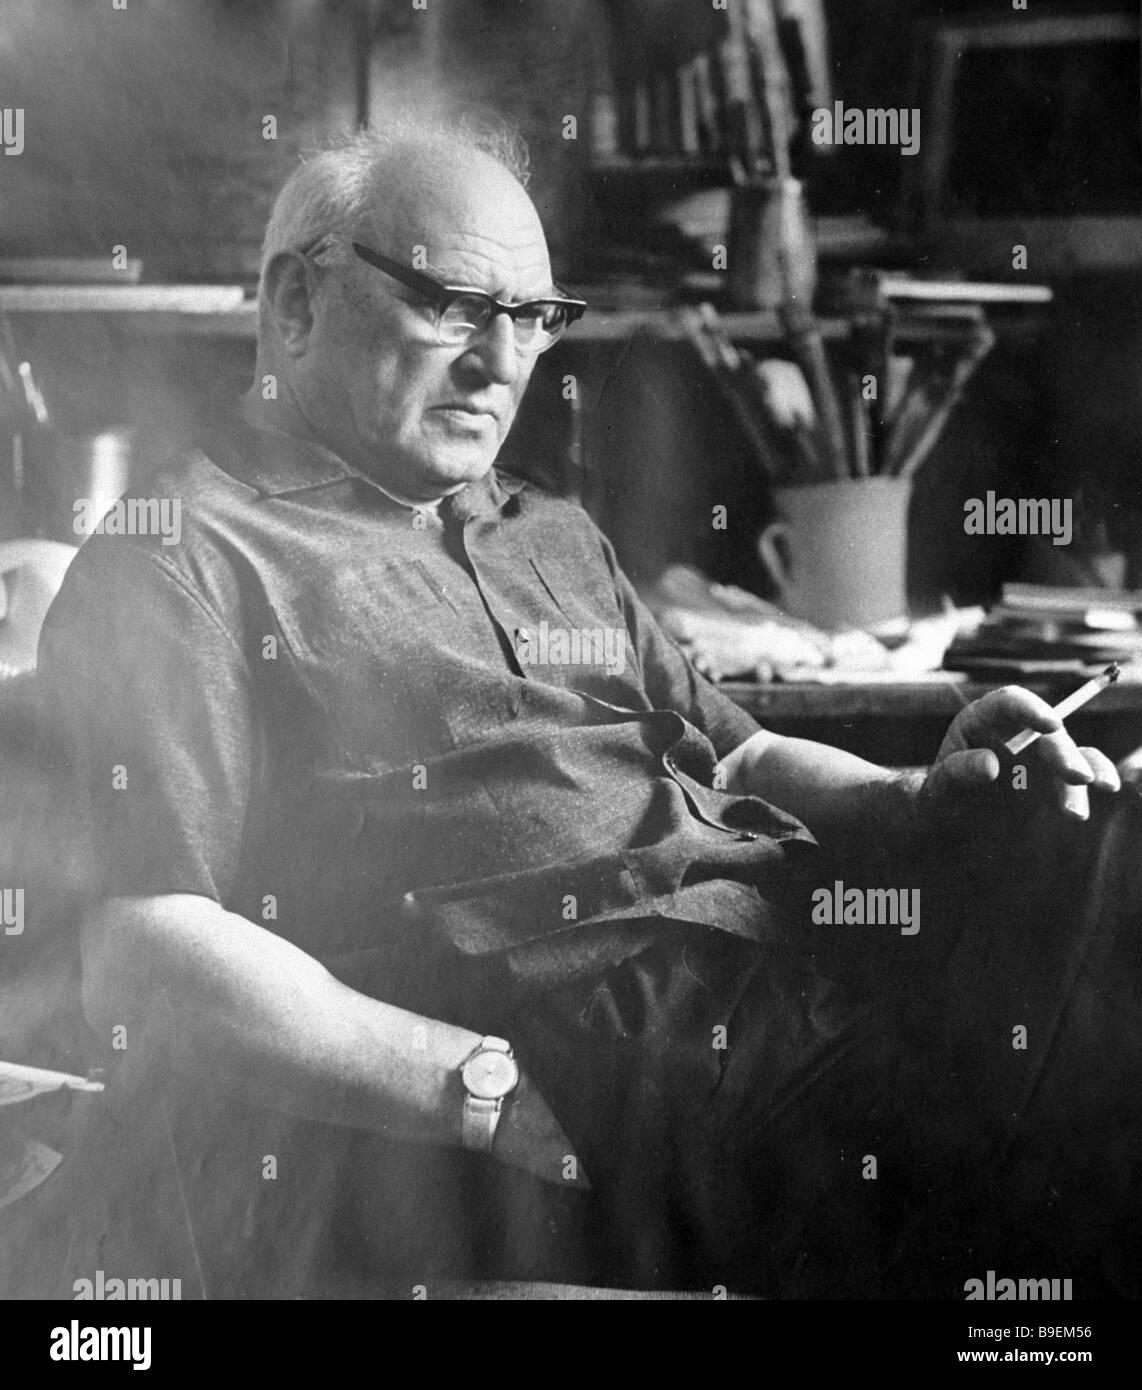 Russische Maler Meister der Buchillustrationen Yevgeny Kibrik 1906 1978 Stockbild